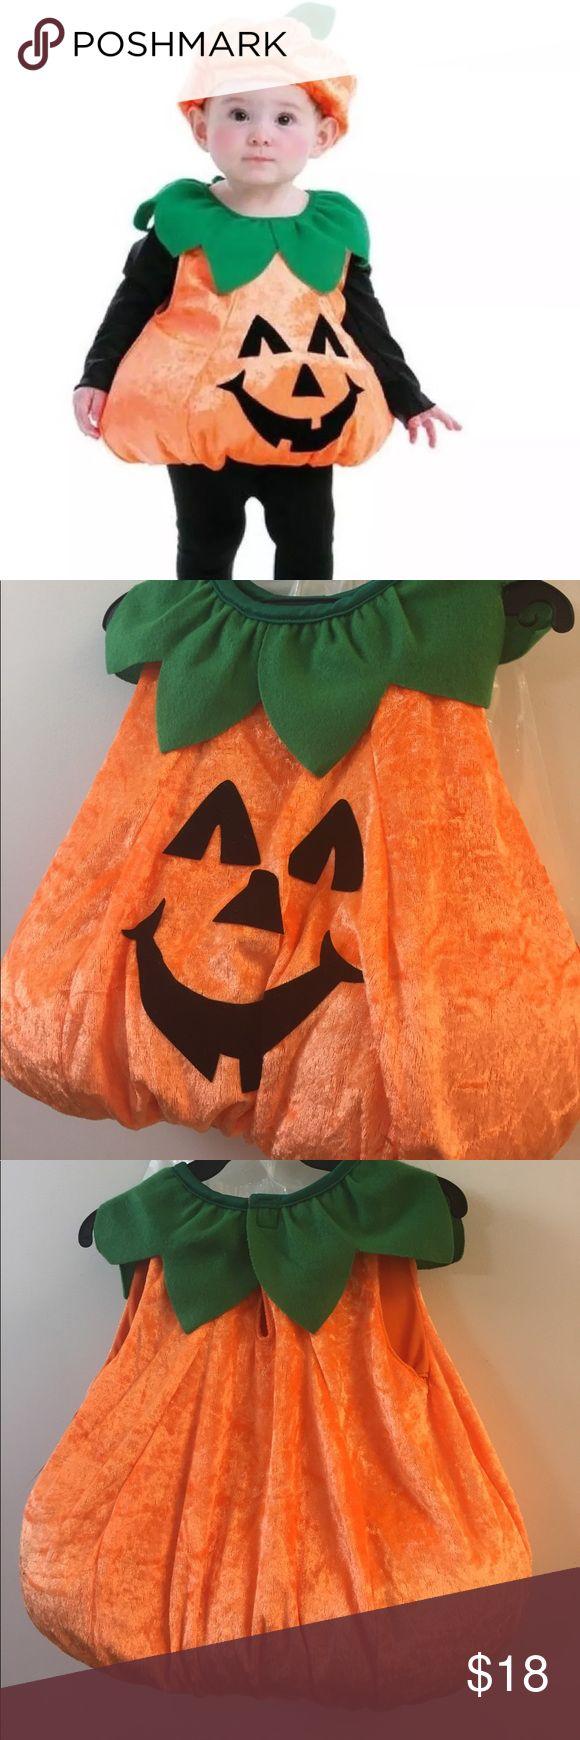 Pumpkin Vest Toddler Kids Costume Sz 1-2 Years Pumpkin Vest Toddler Kids Costume Size 1-2 Years  Includes:  • boby  • Hat  • Shoes Costumes Halloween